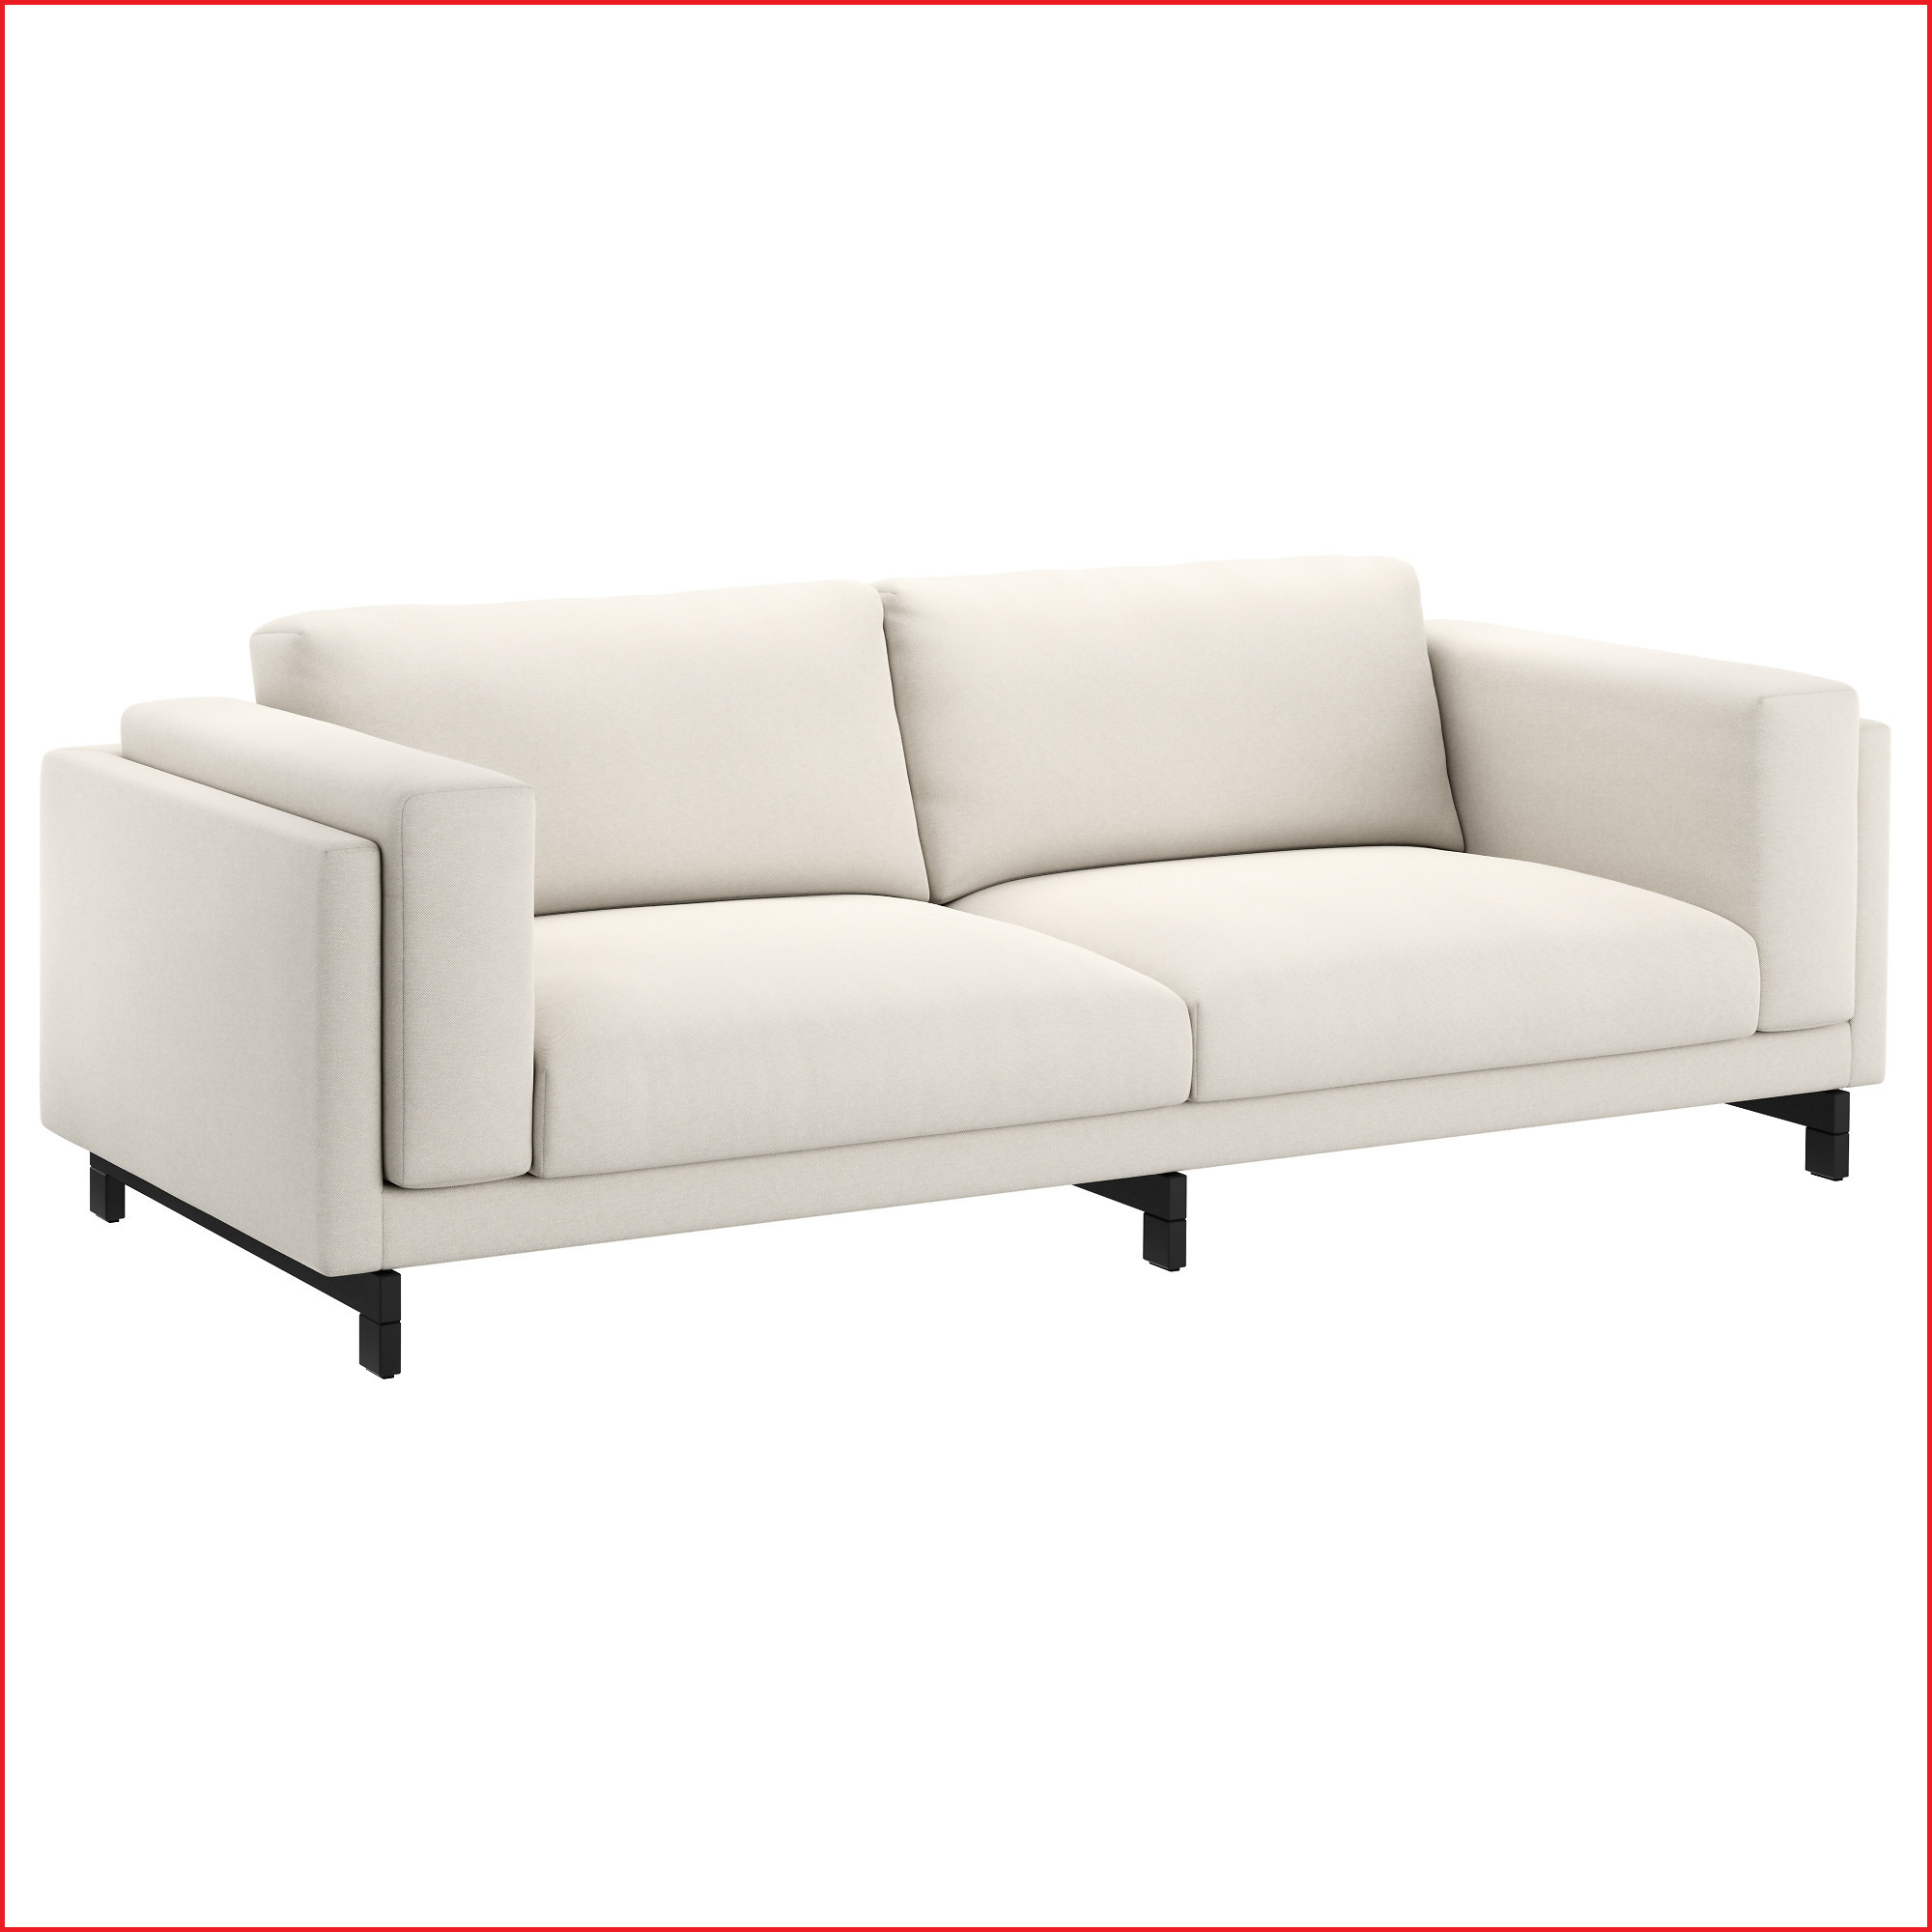 Sofa Cama Ektorp 3ldq New Ikea Ektorp Sofa Bed 2seater Cover For